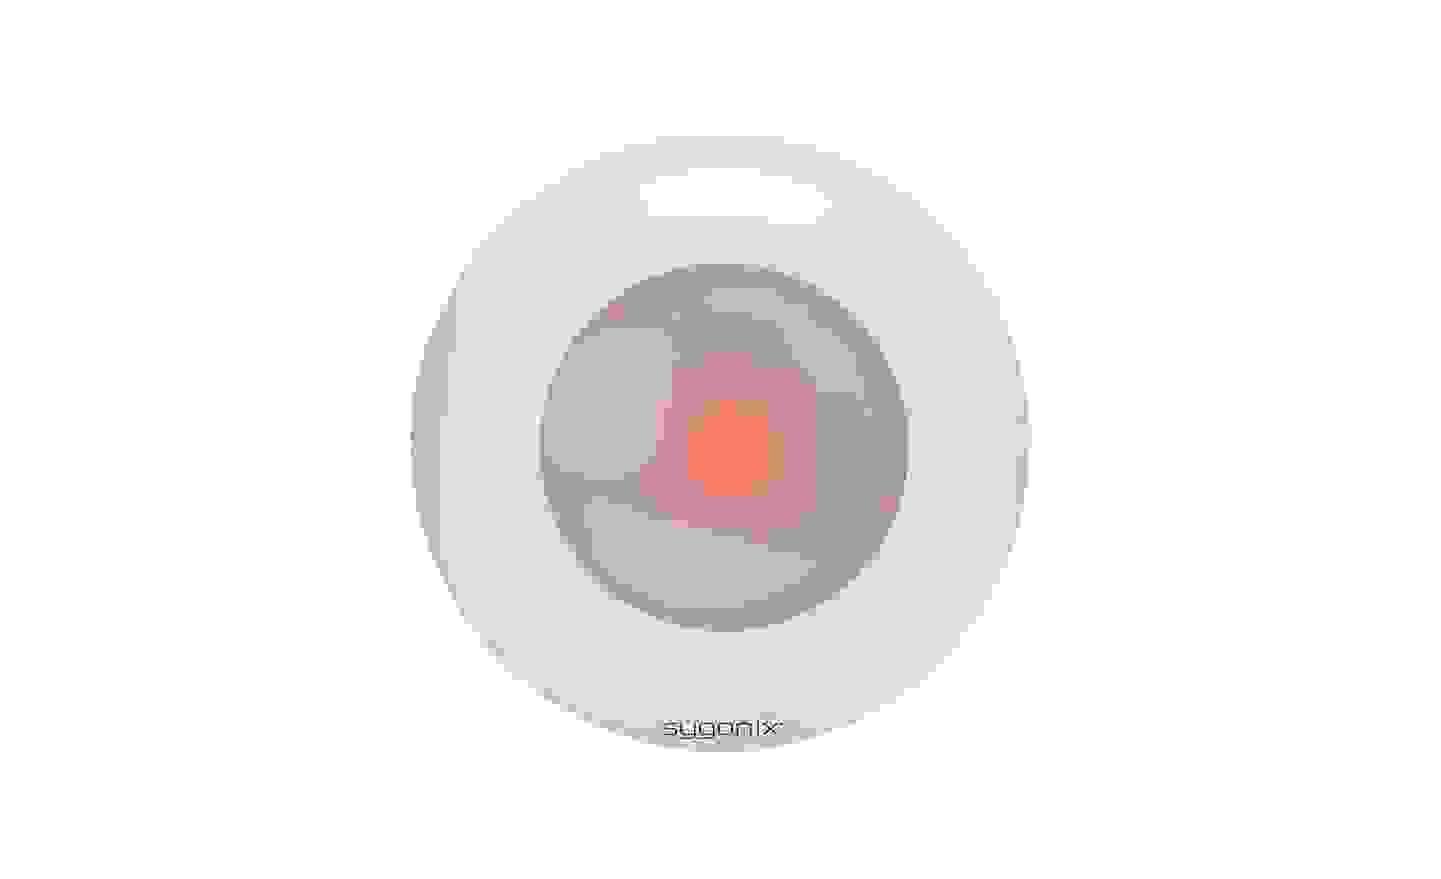 Sygonix - Systèmes d'alarme